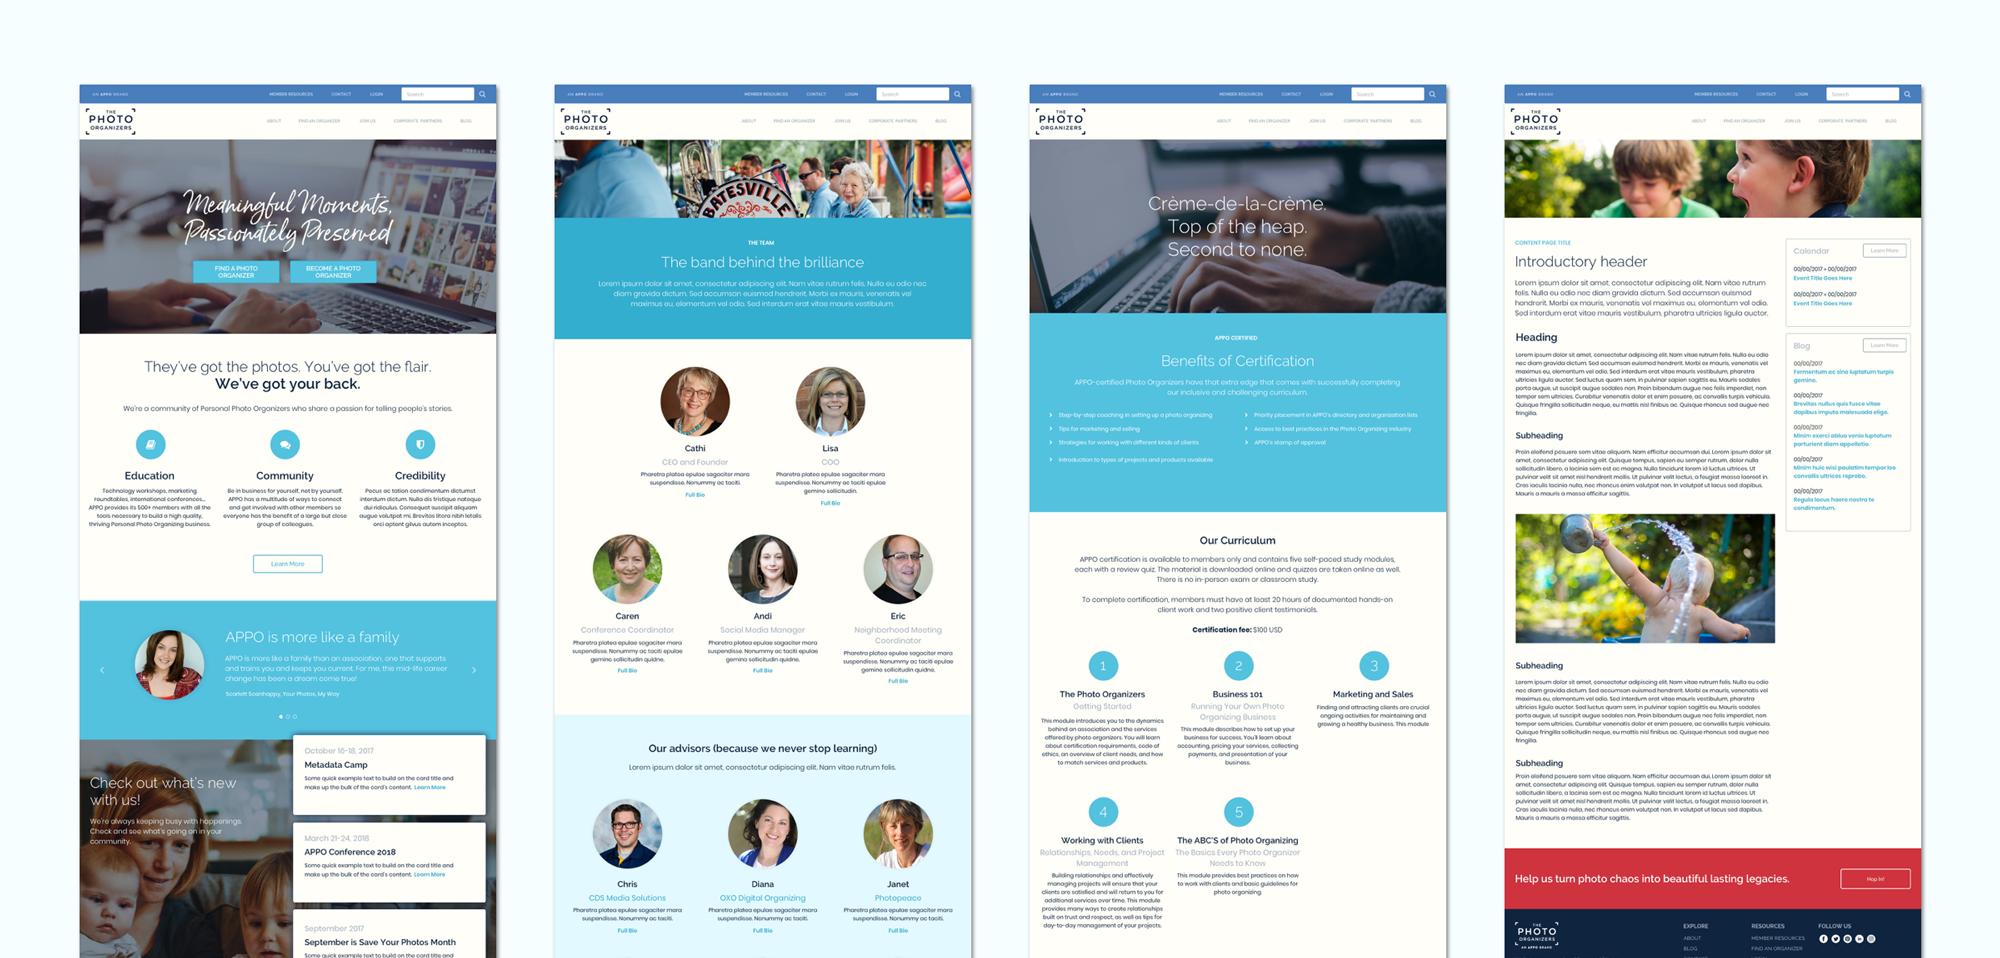 APPO Website User Interface